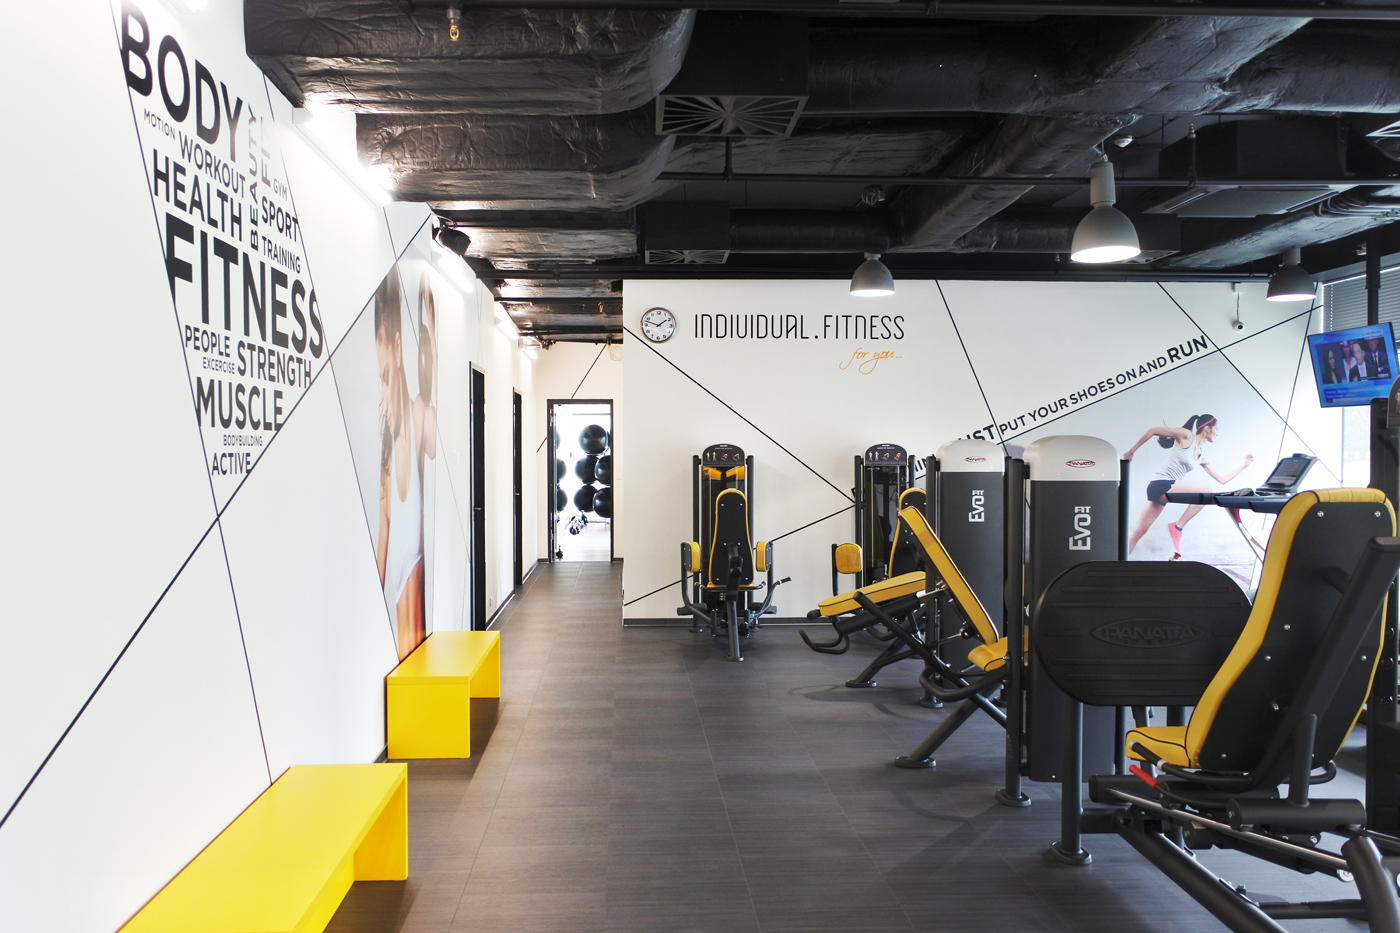 Interiér fitness centra Individual.Fitness